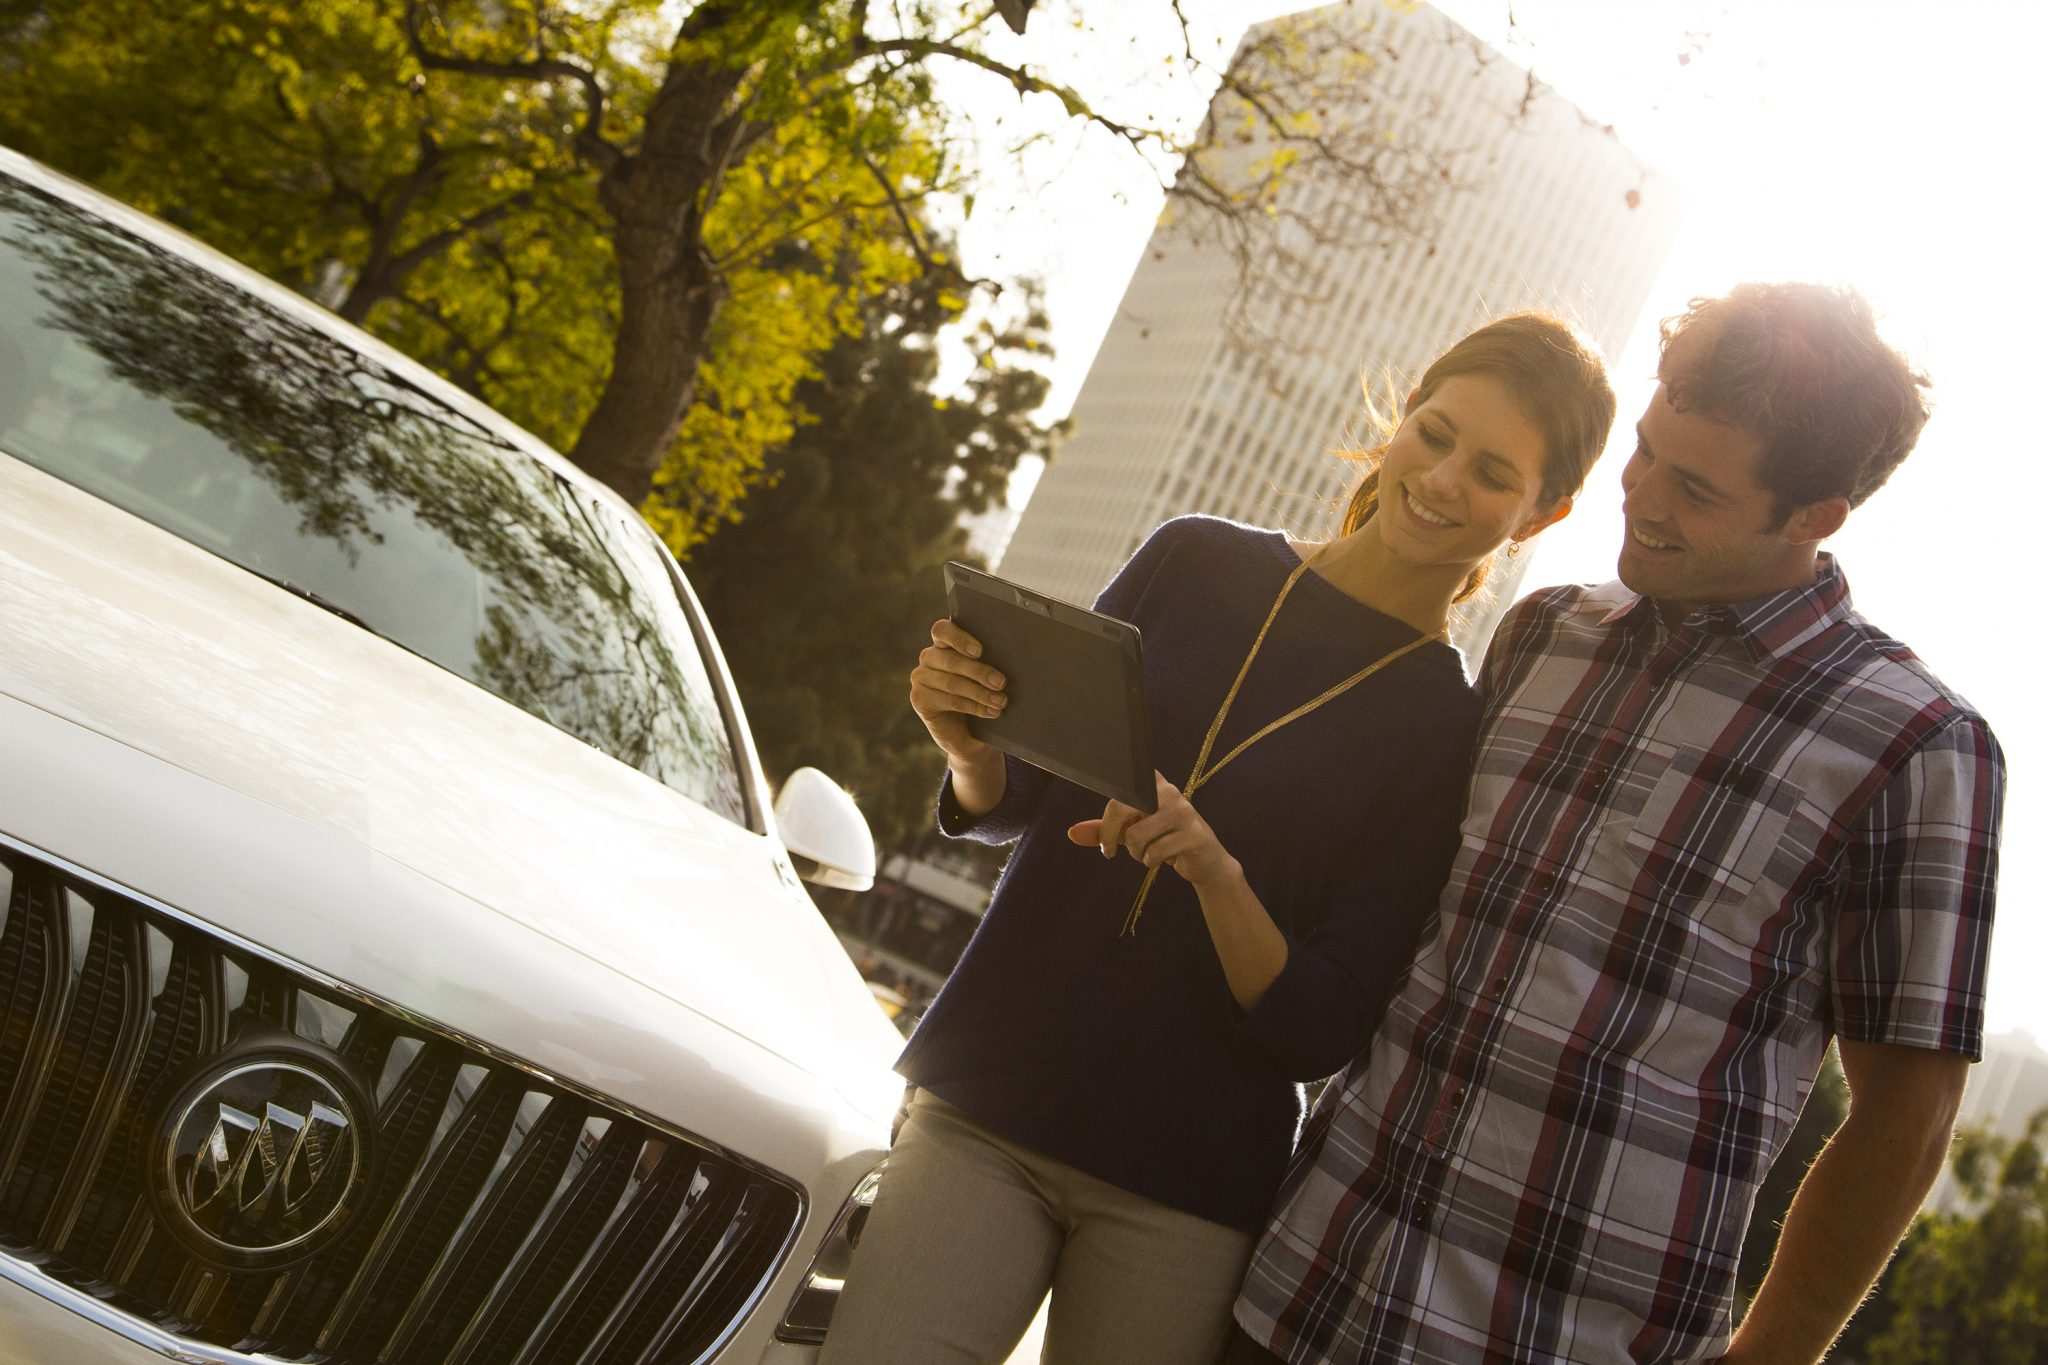 2015 Buick LaCrosse: Best Car for Road Trips